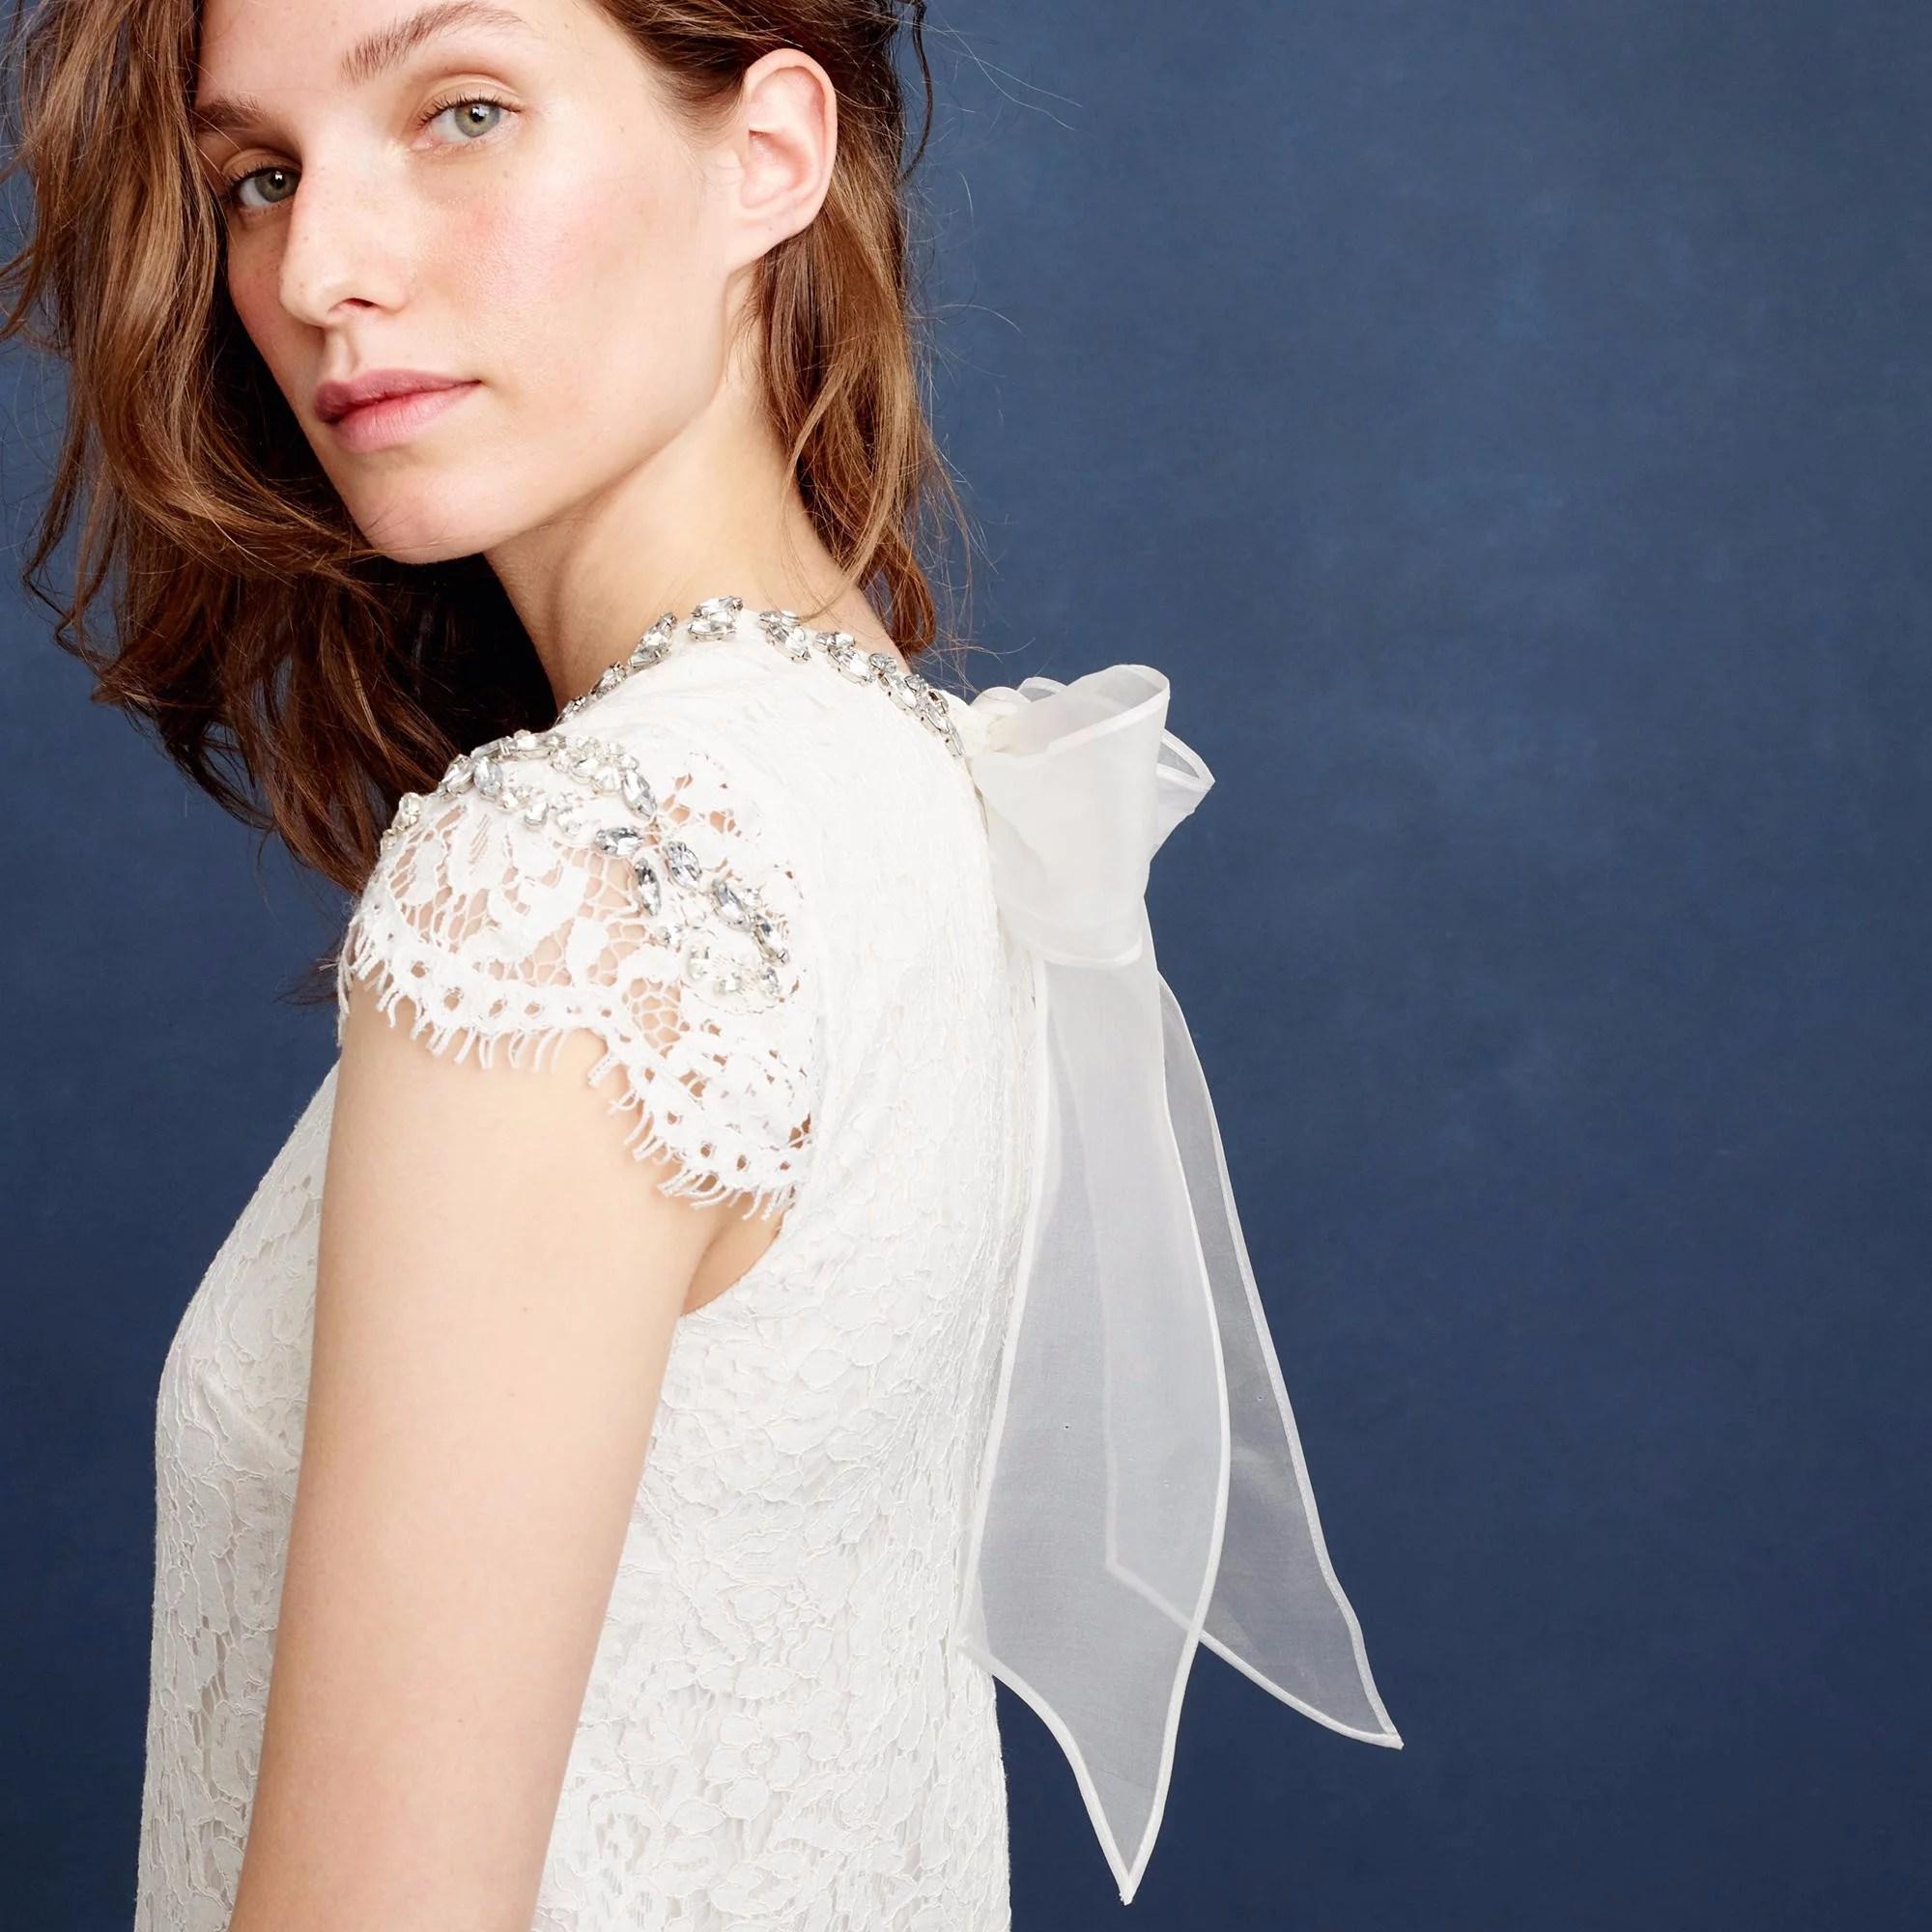 J Crew Wedding Dresses Discontinued j crew wedding dress